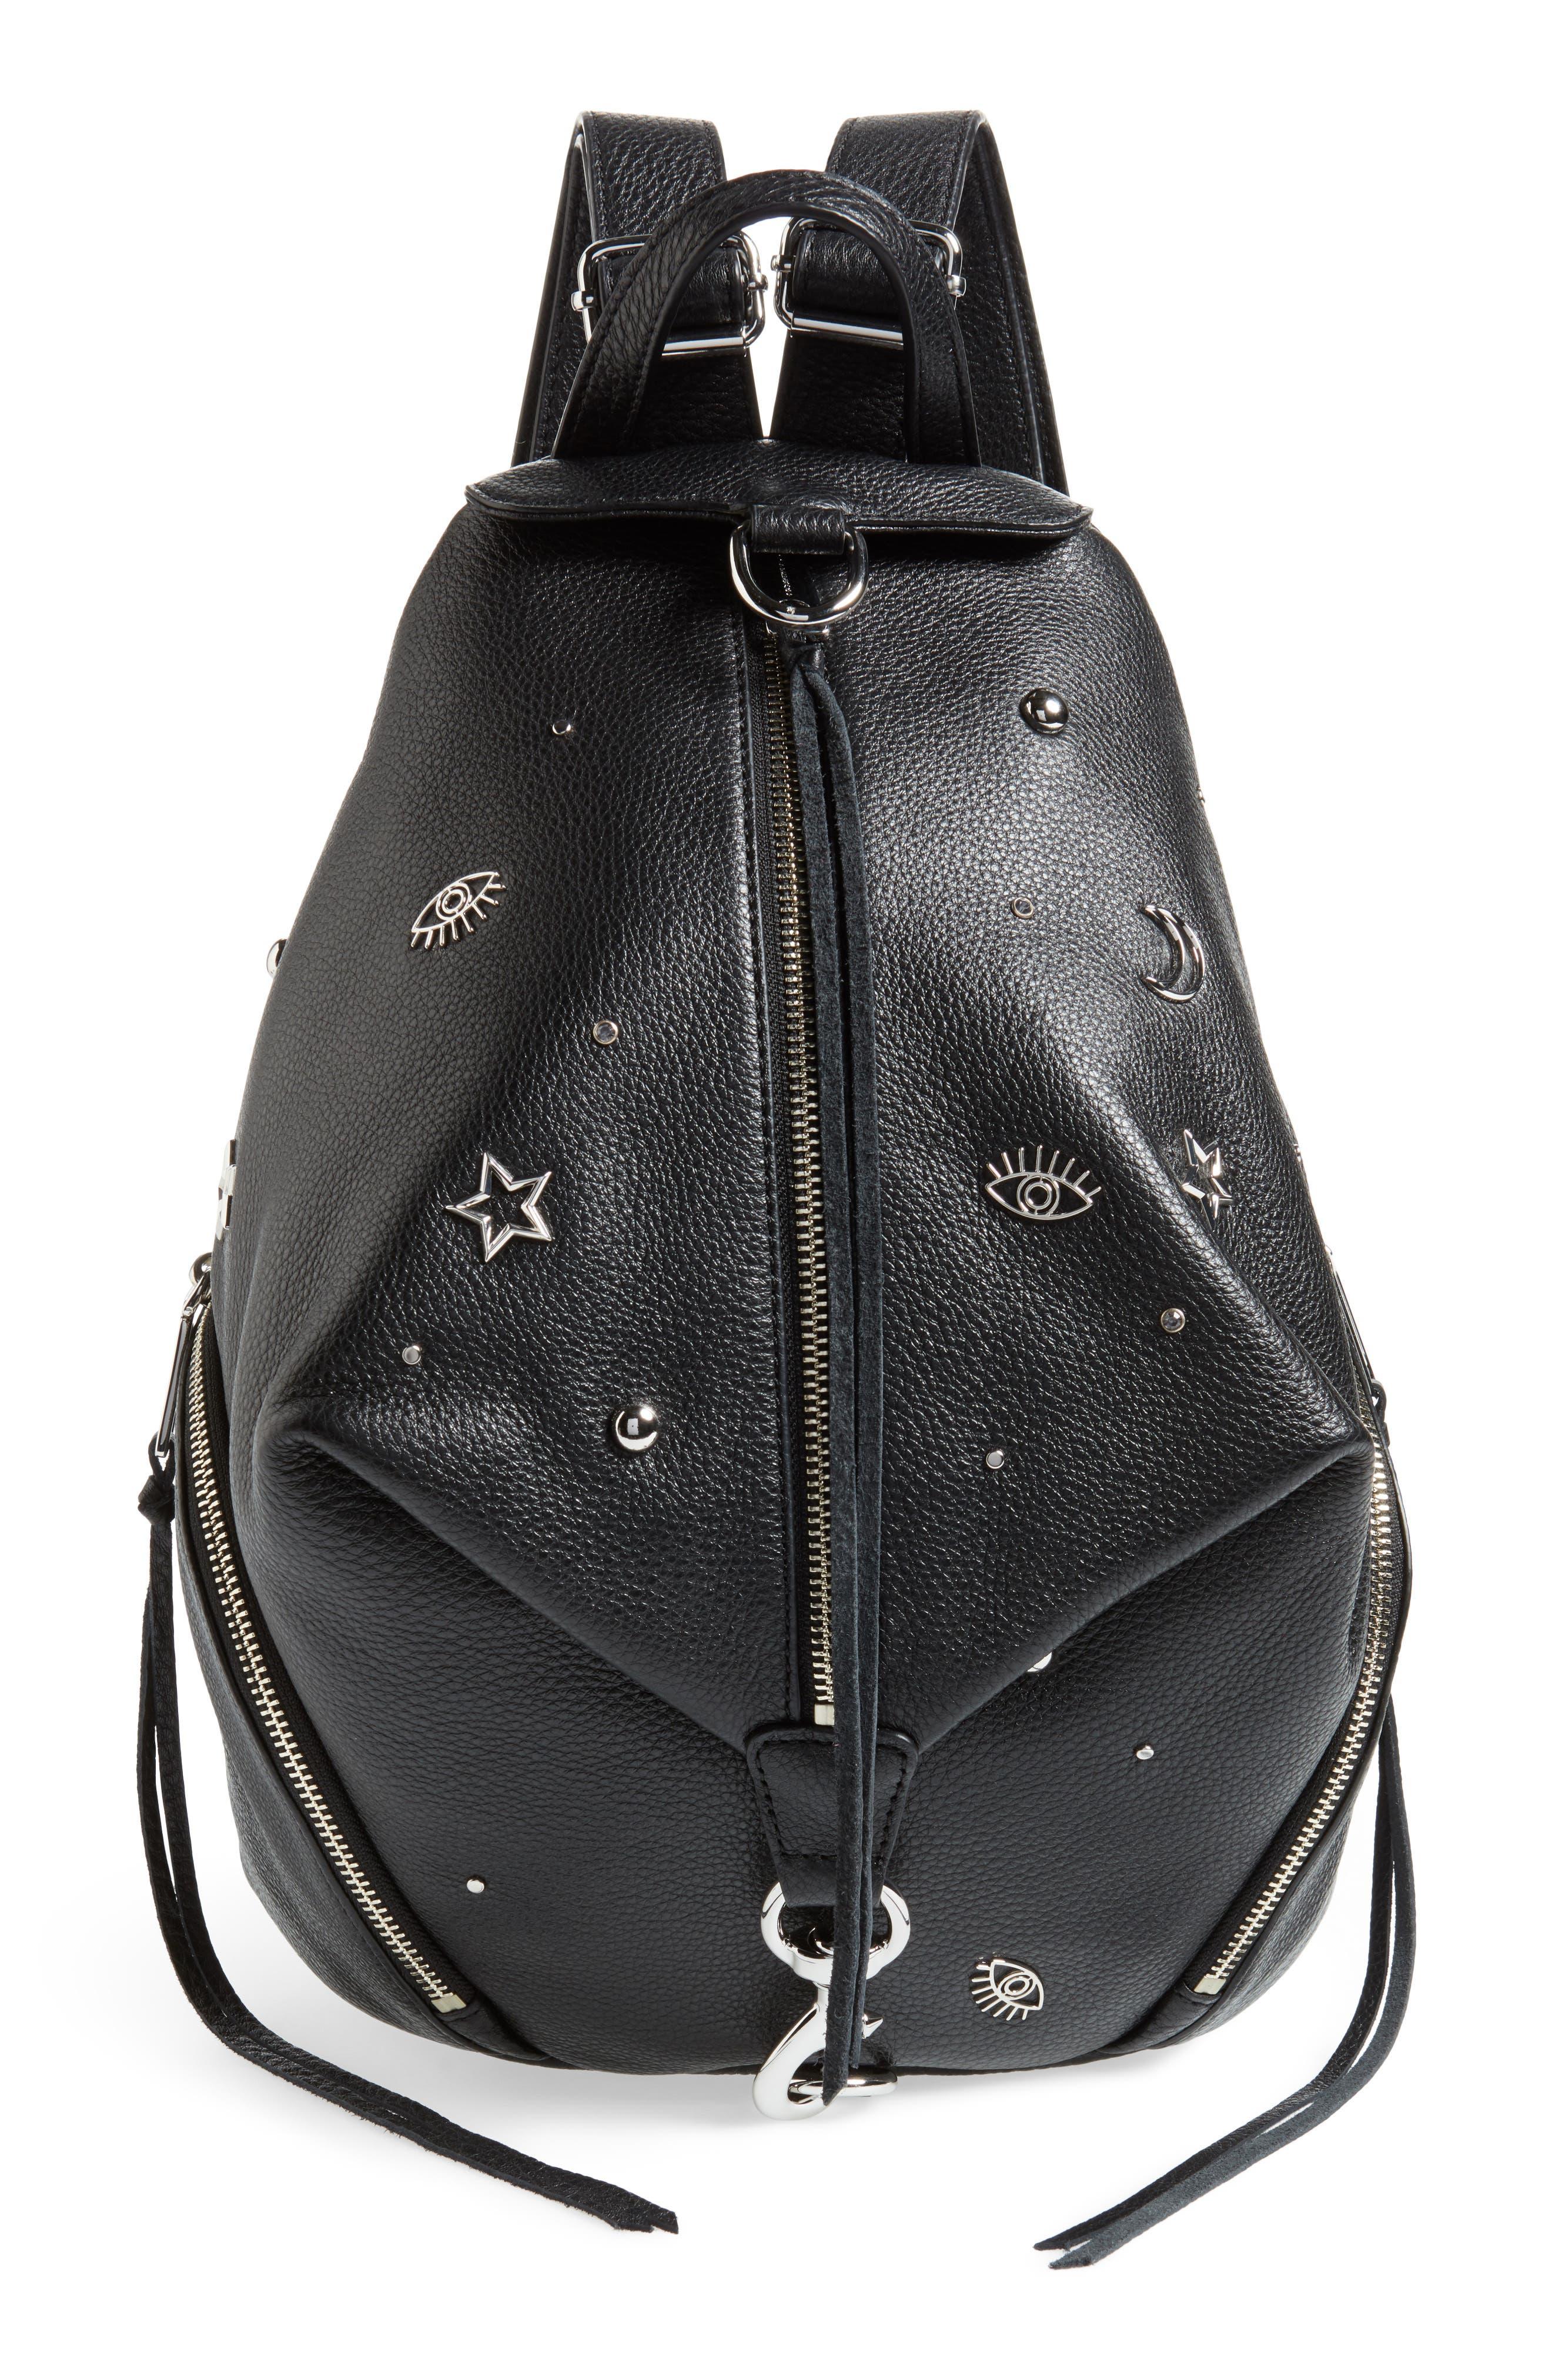 Julian Embellished Leather Backpack,                             Main thumbnail 1, color,                             001